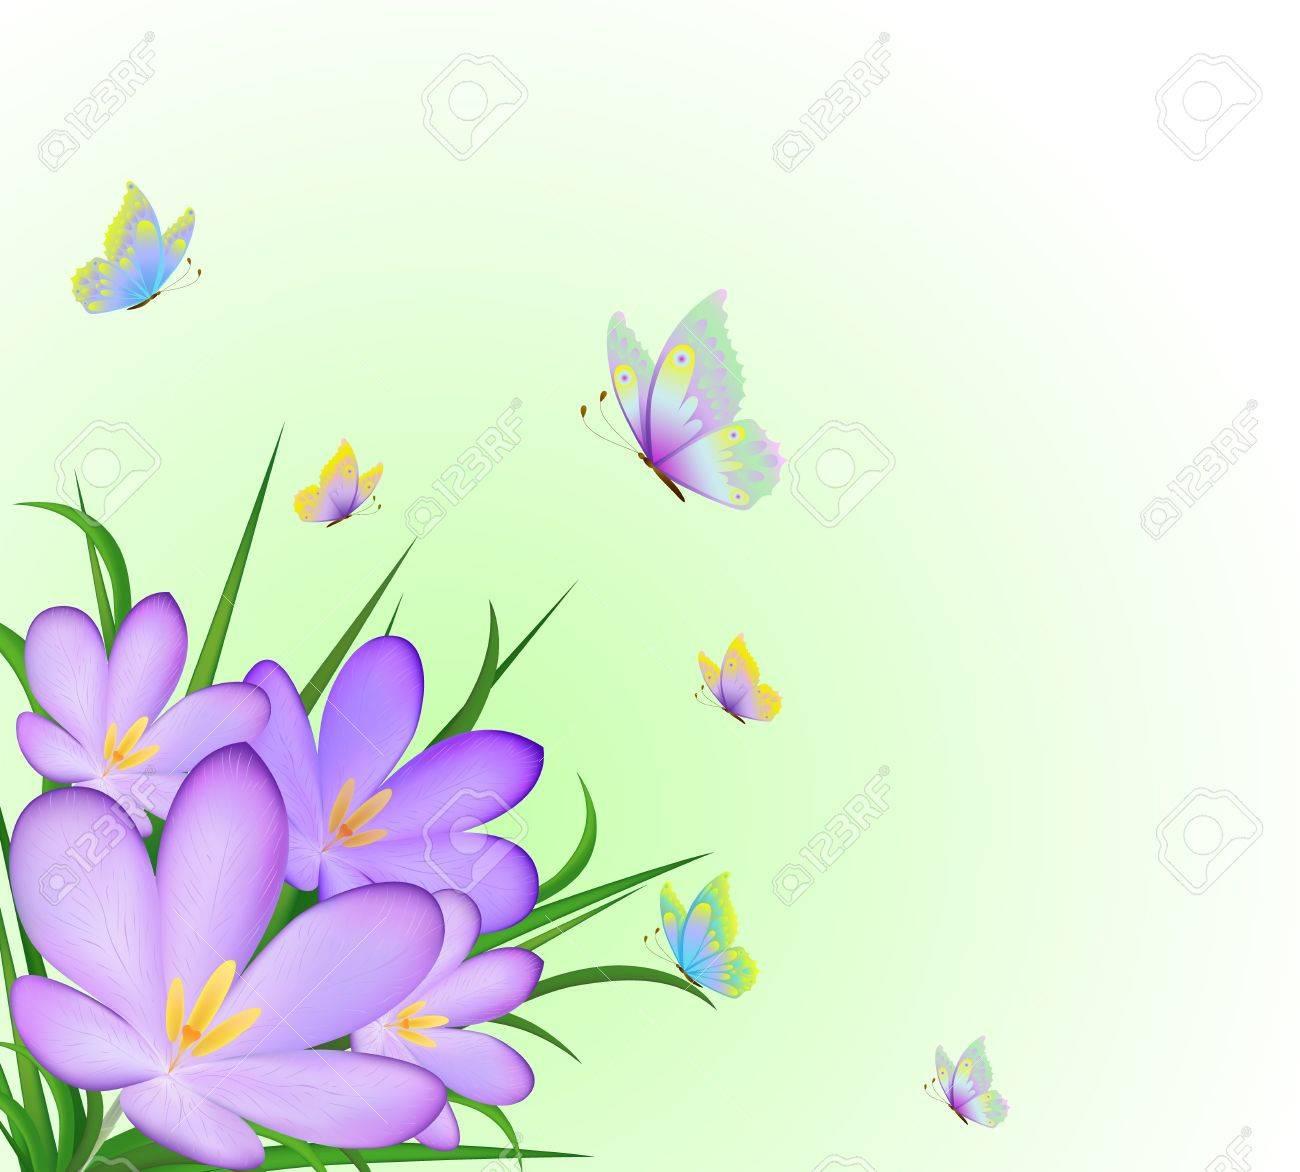 Illustration of crocus and flying butterflies Stock Vector - 10790072